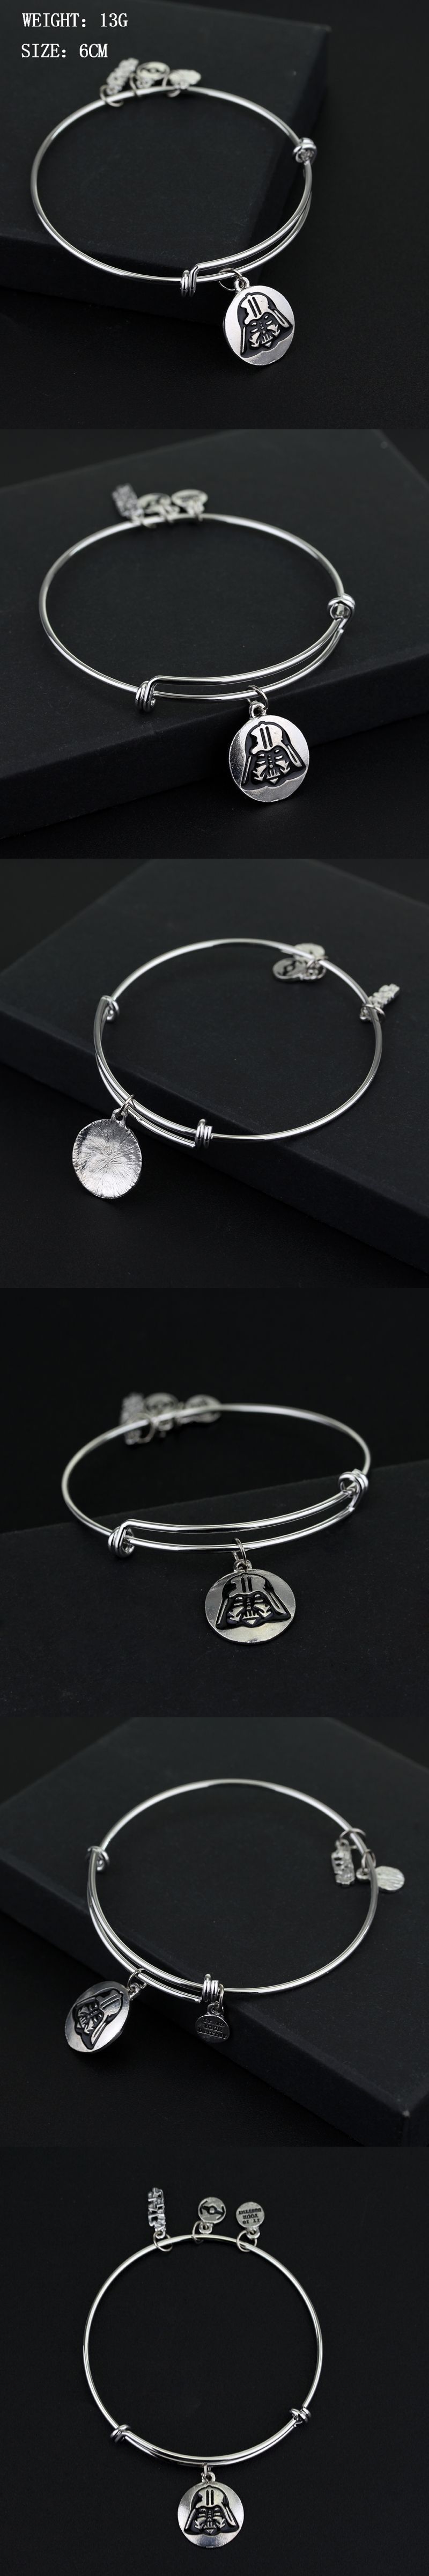 Women girls fashion jewelry bracelets cool jewelry bracelets star